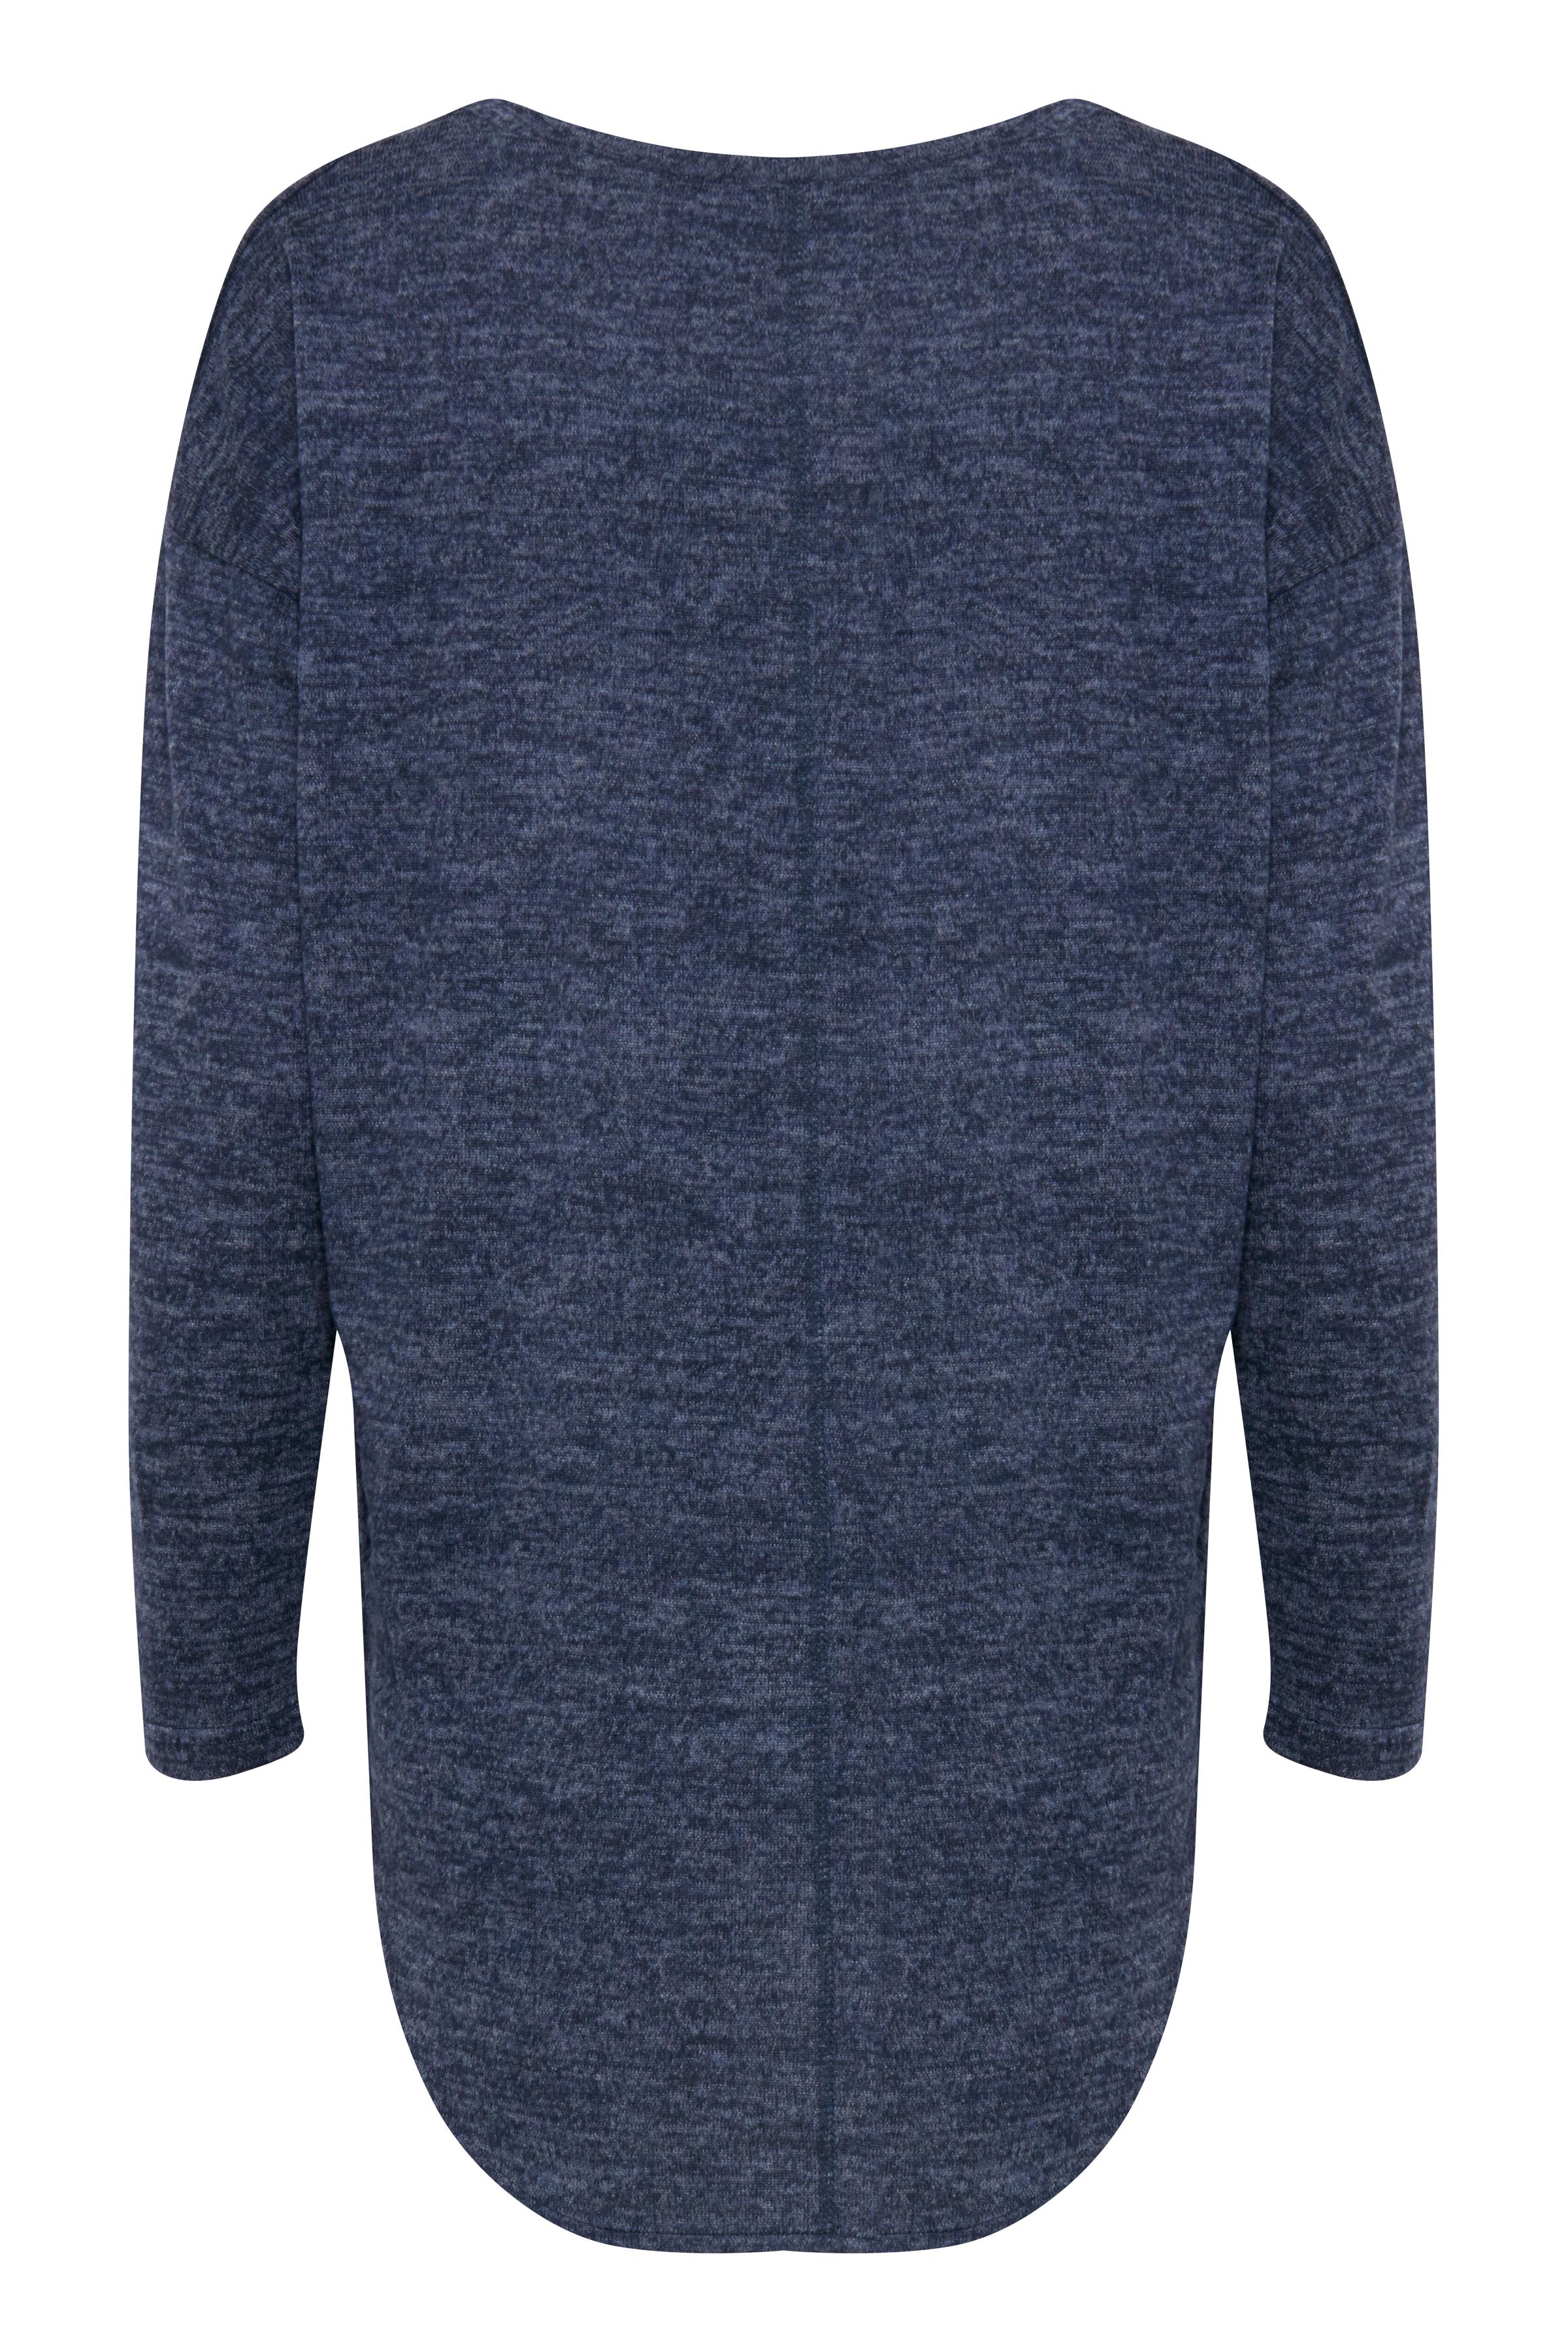 Copenhagen Night Mel. Jersey tunic from b.young – Buy Copenhagen Night Mel. Jersey tunic from size S-XL here